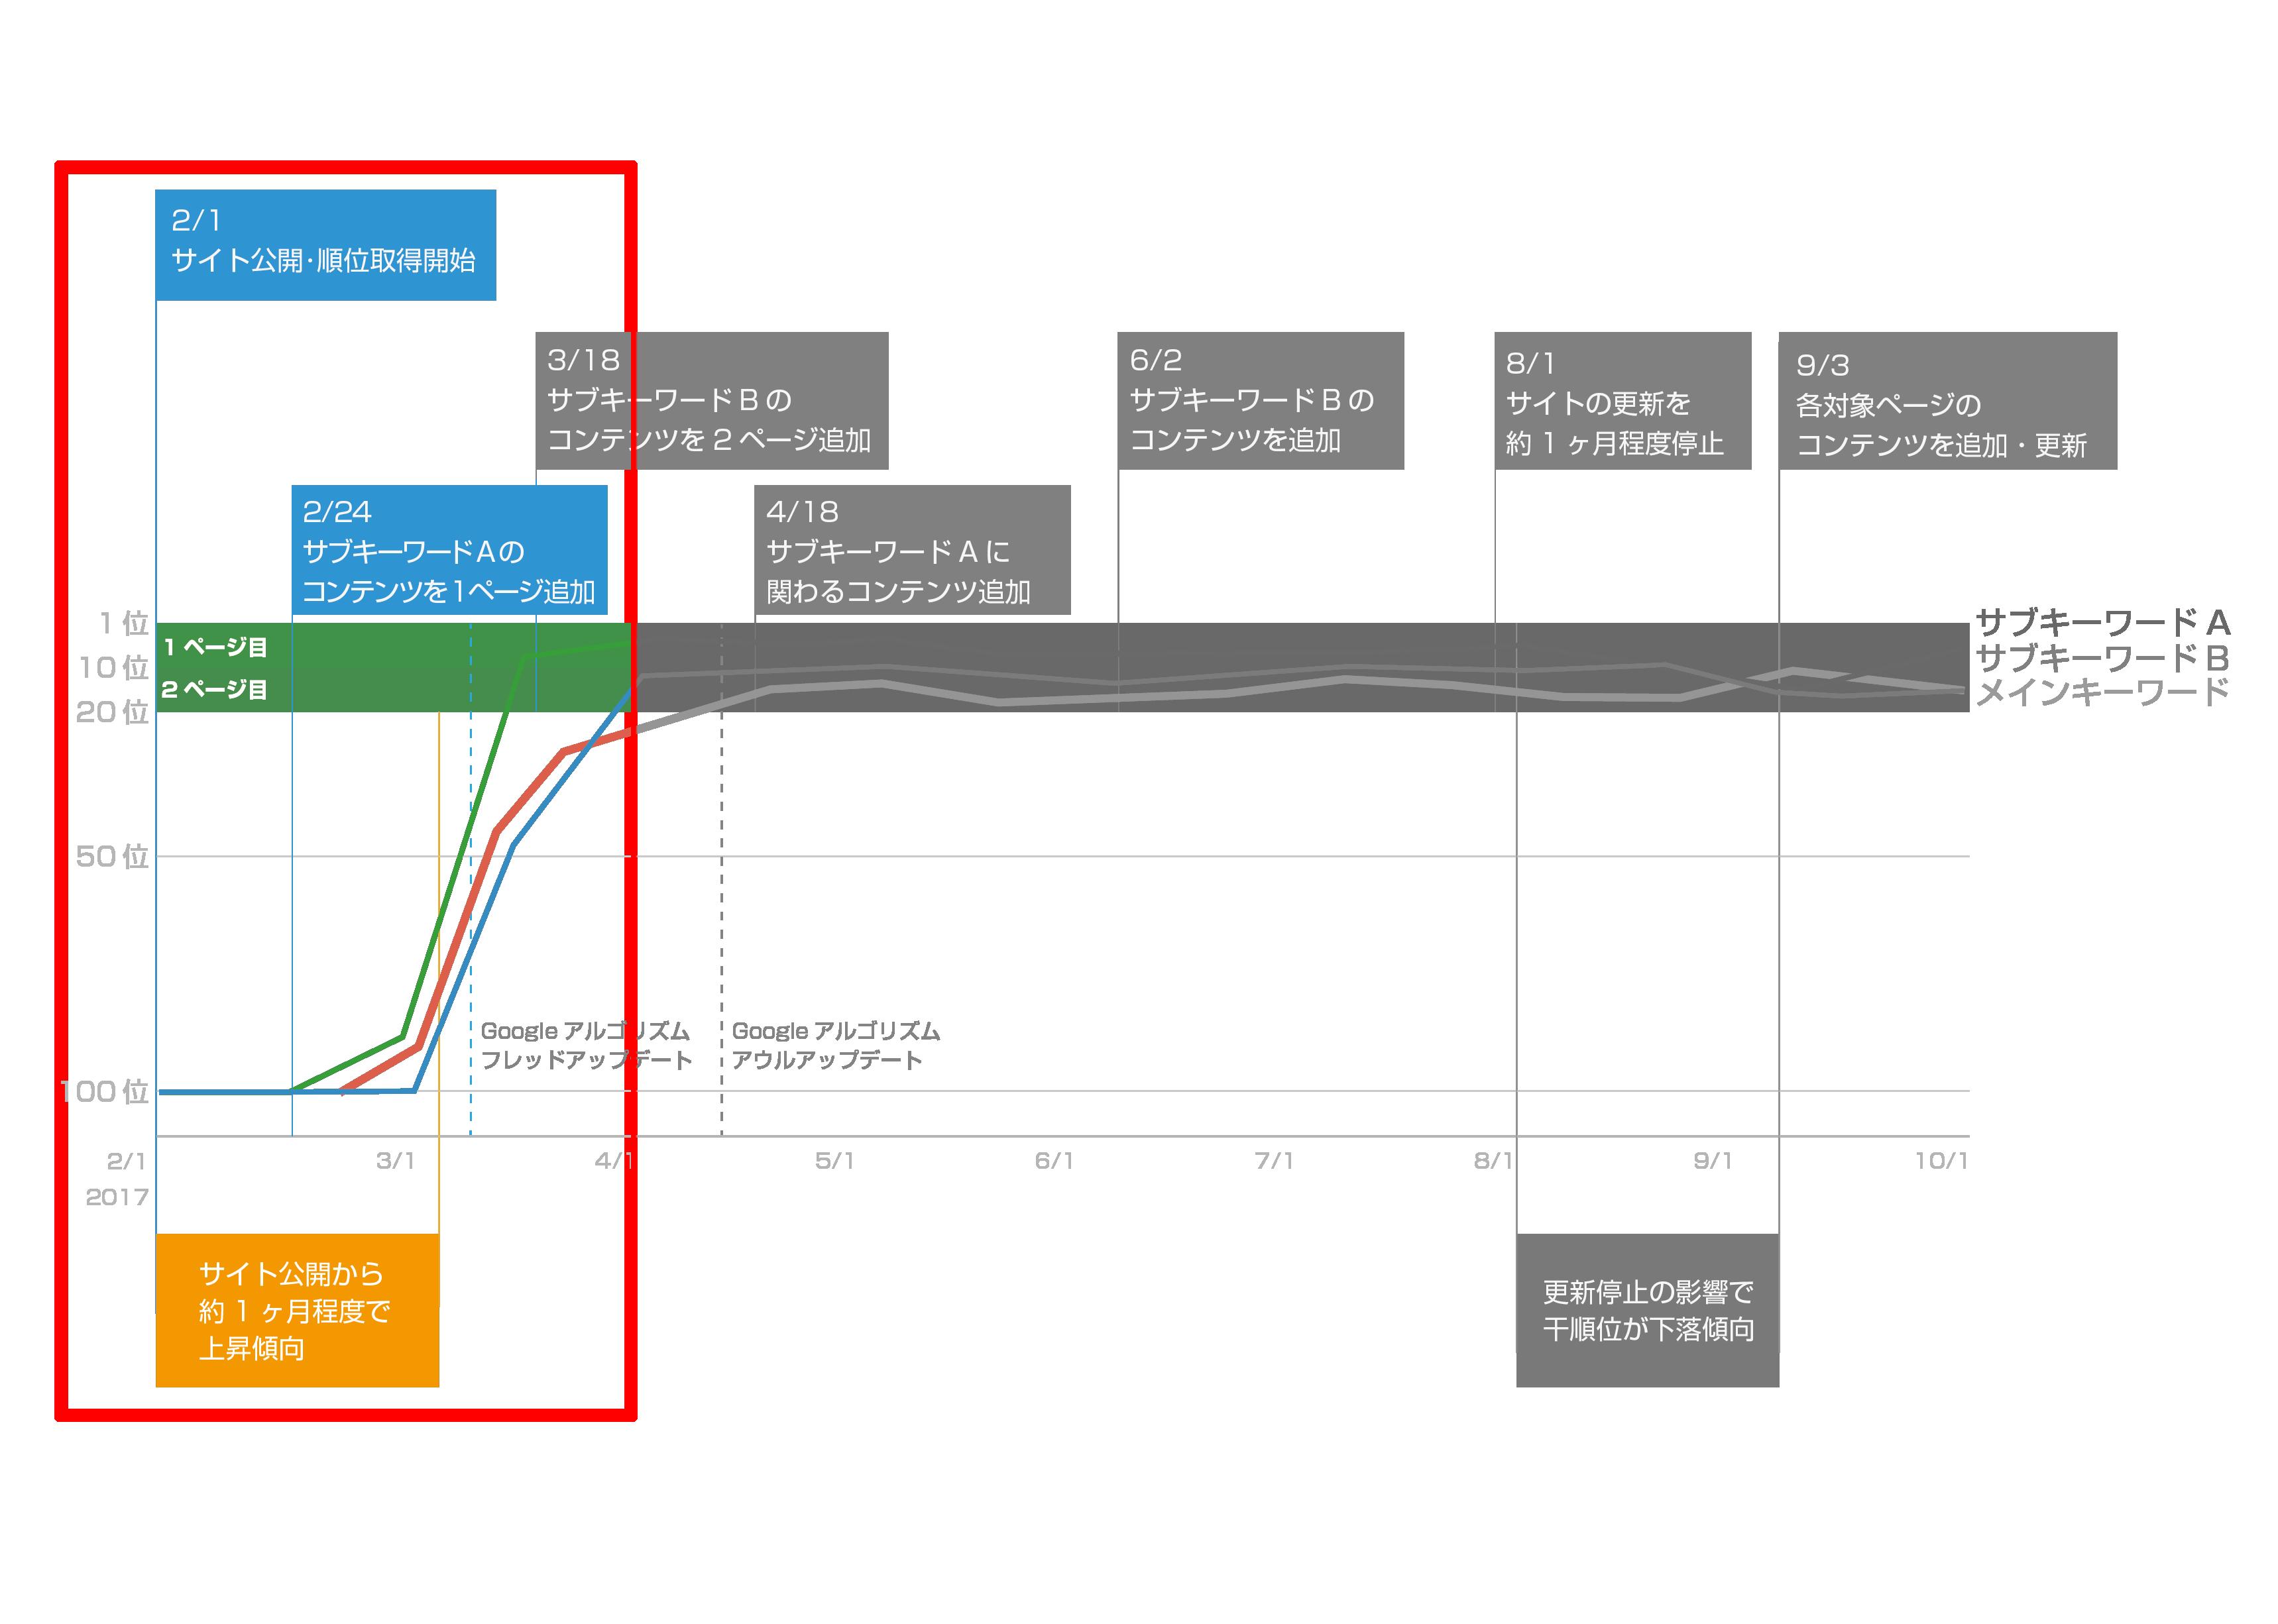 SEO対策の順位グラフと施策2